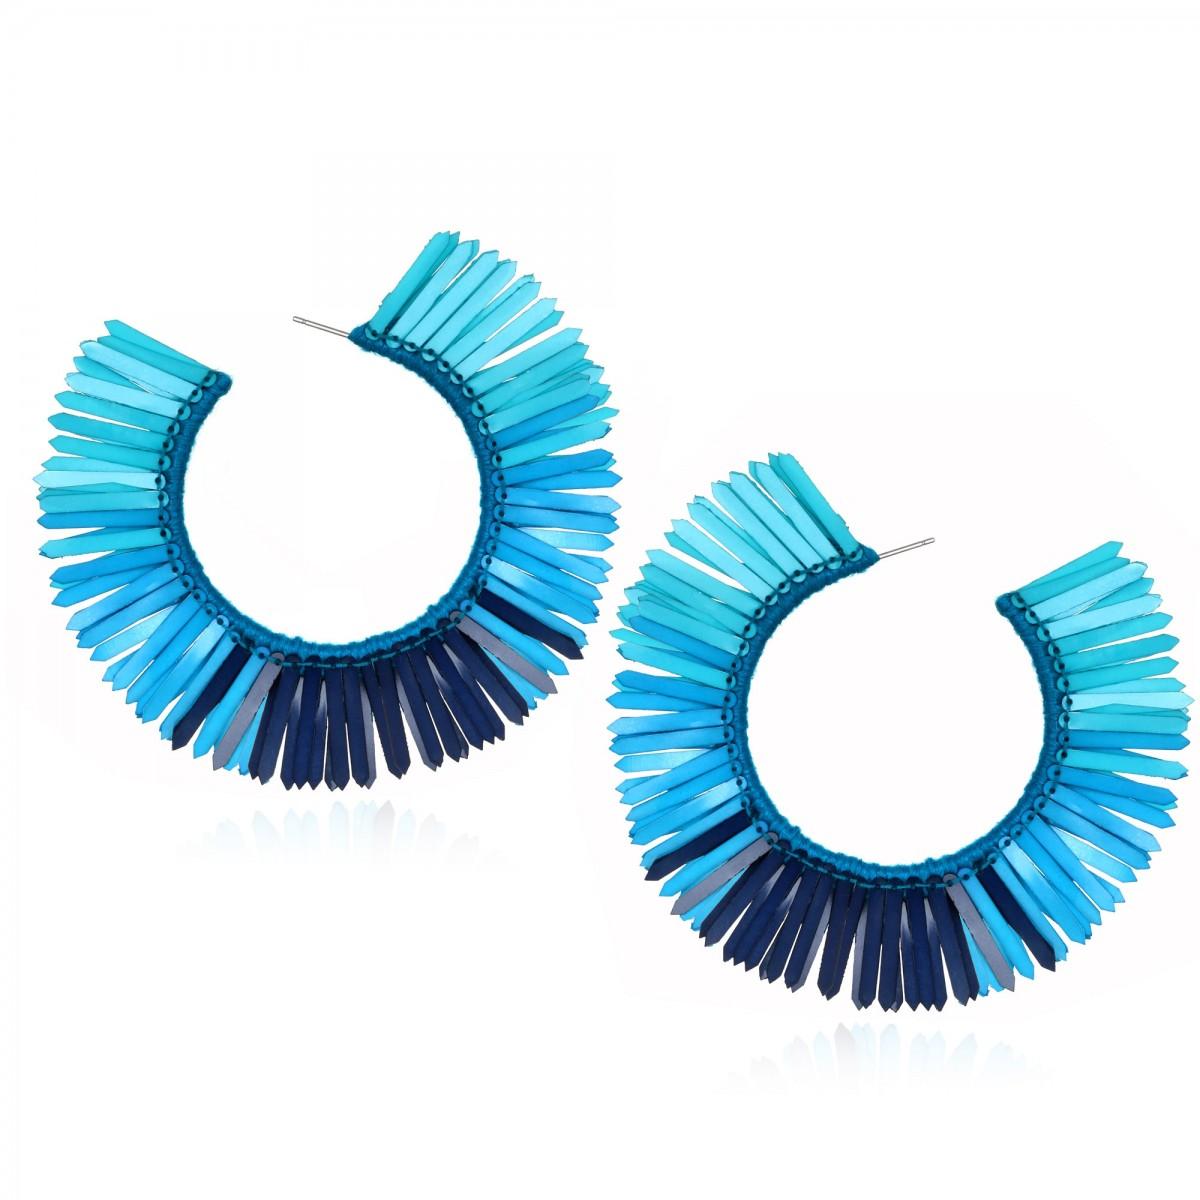 Turquoise Karaja Hoop Earrings by SUZANNA DAI